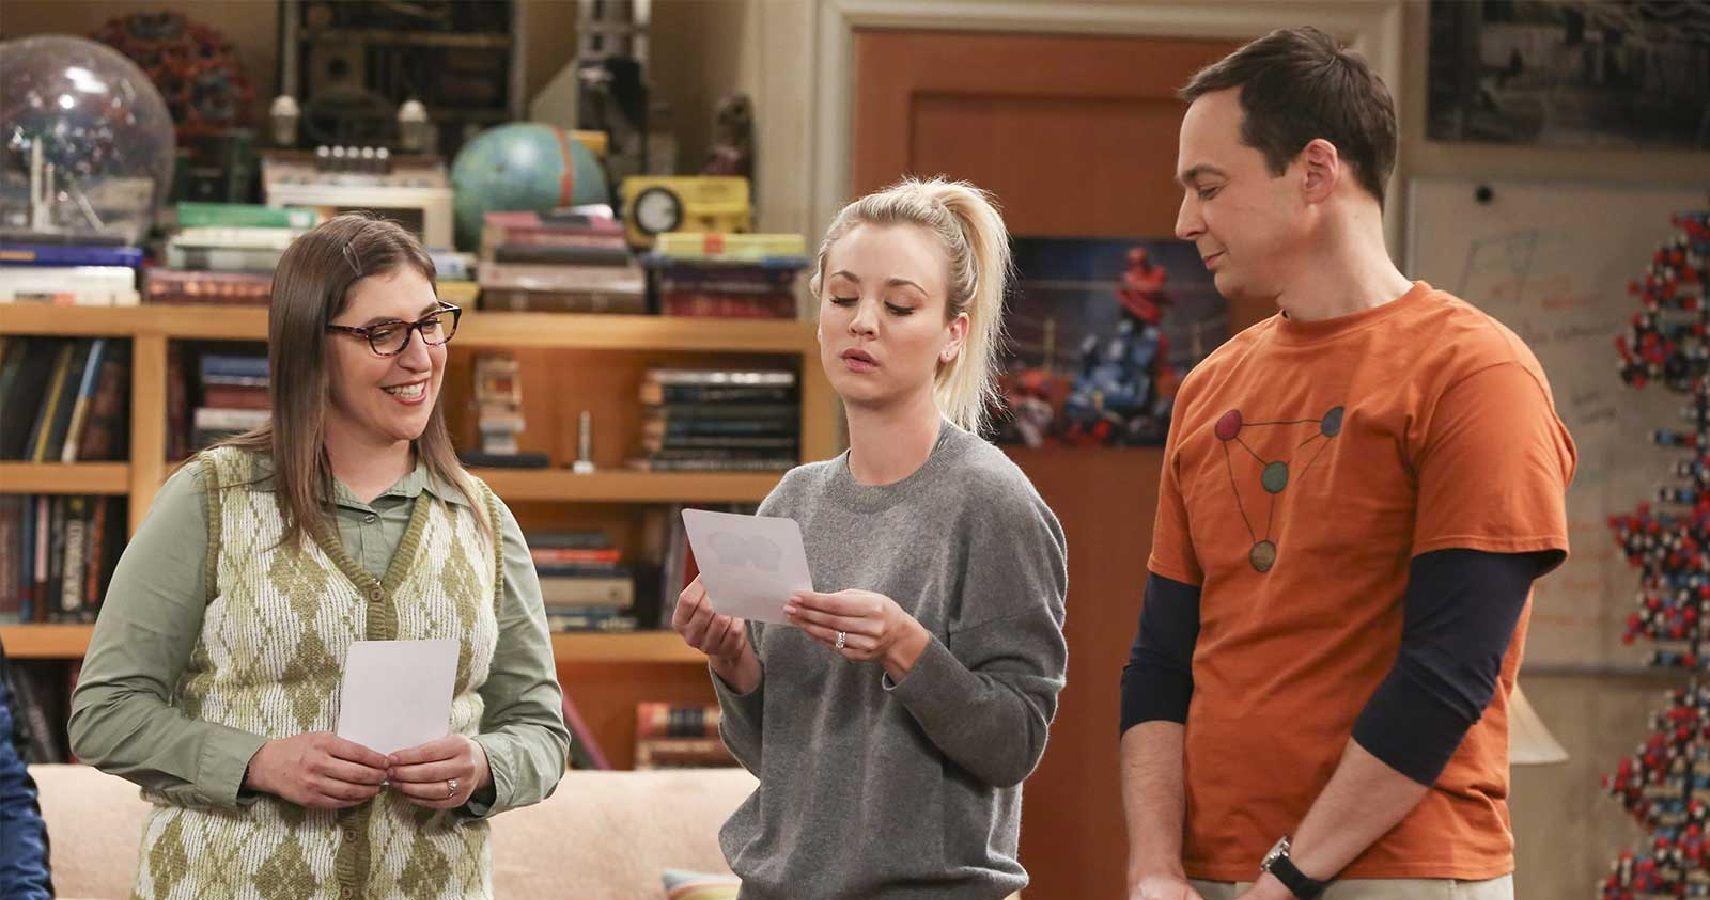 The Big Bang Theory: The Worst Episode Of Every Season, According To IMDb